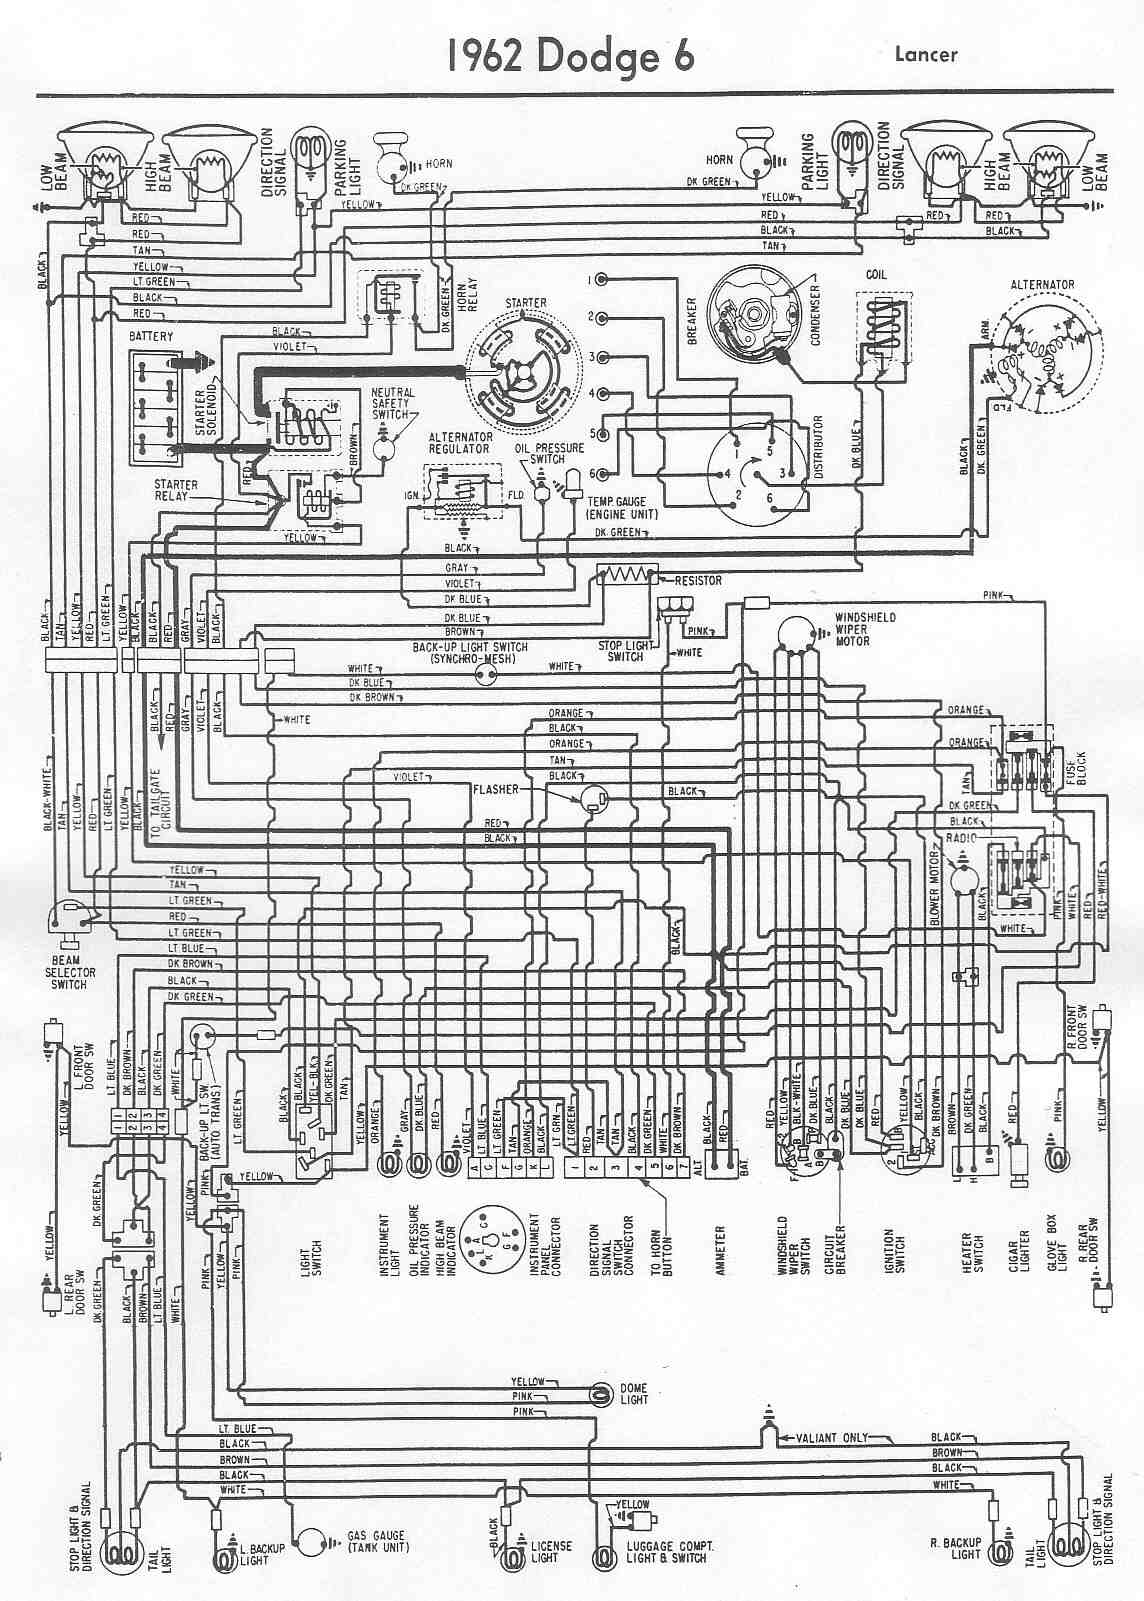 medium resolution of dodge car manuals wiring diagrams pdf fault codes